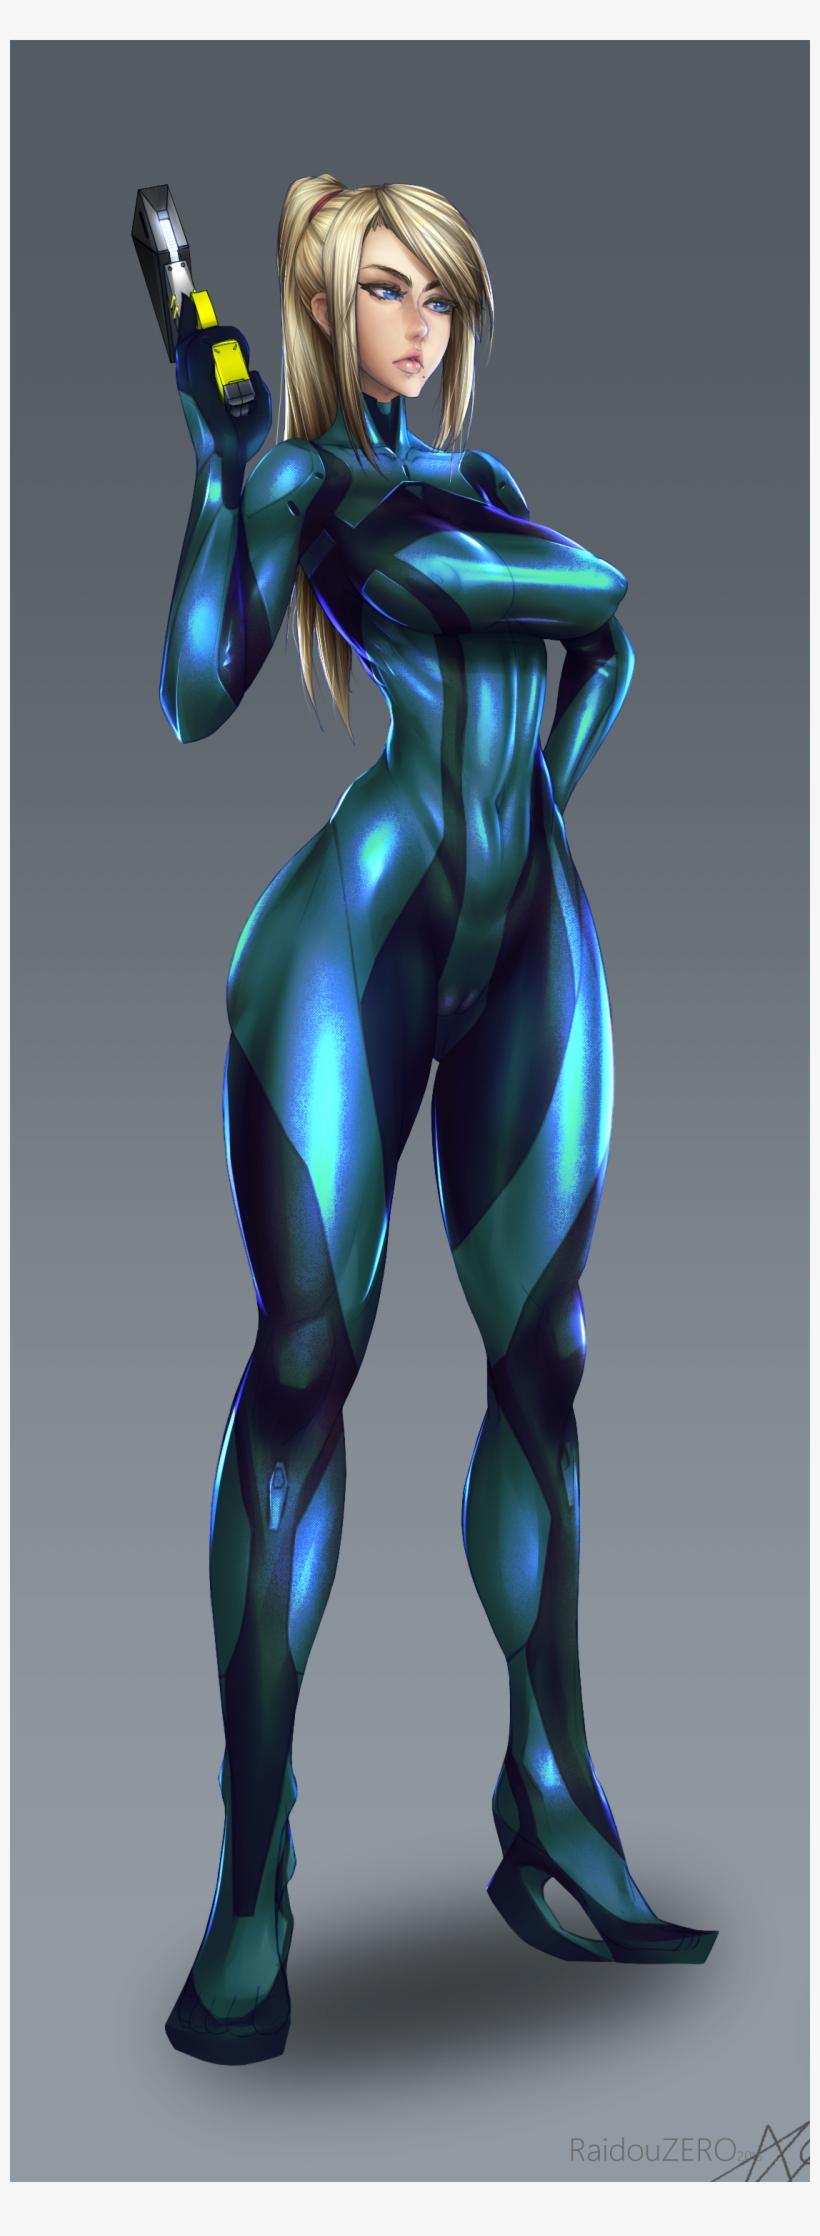 Zero Suit Samus Samus Aran 3d Sexy Free Transparent Png